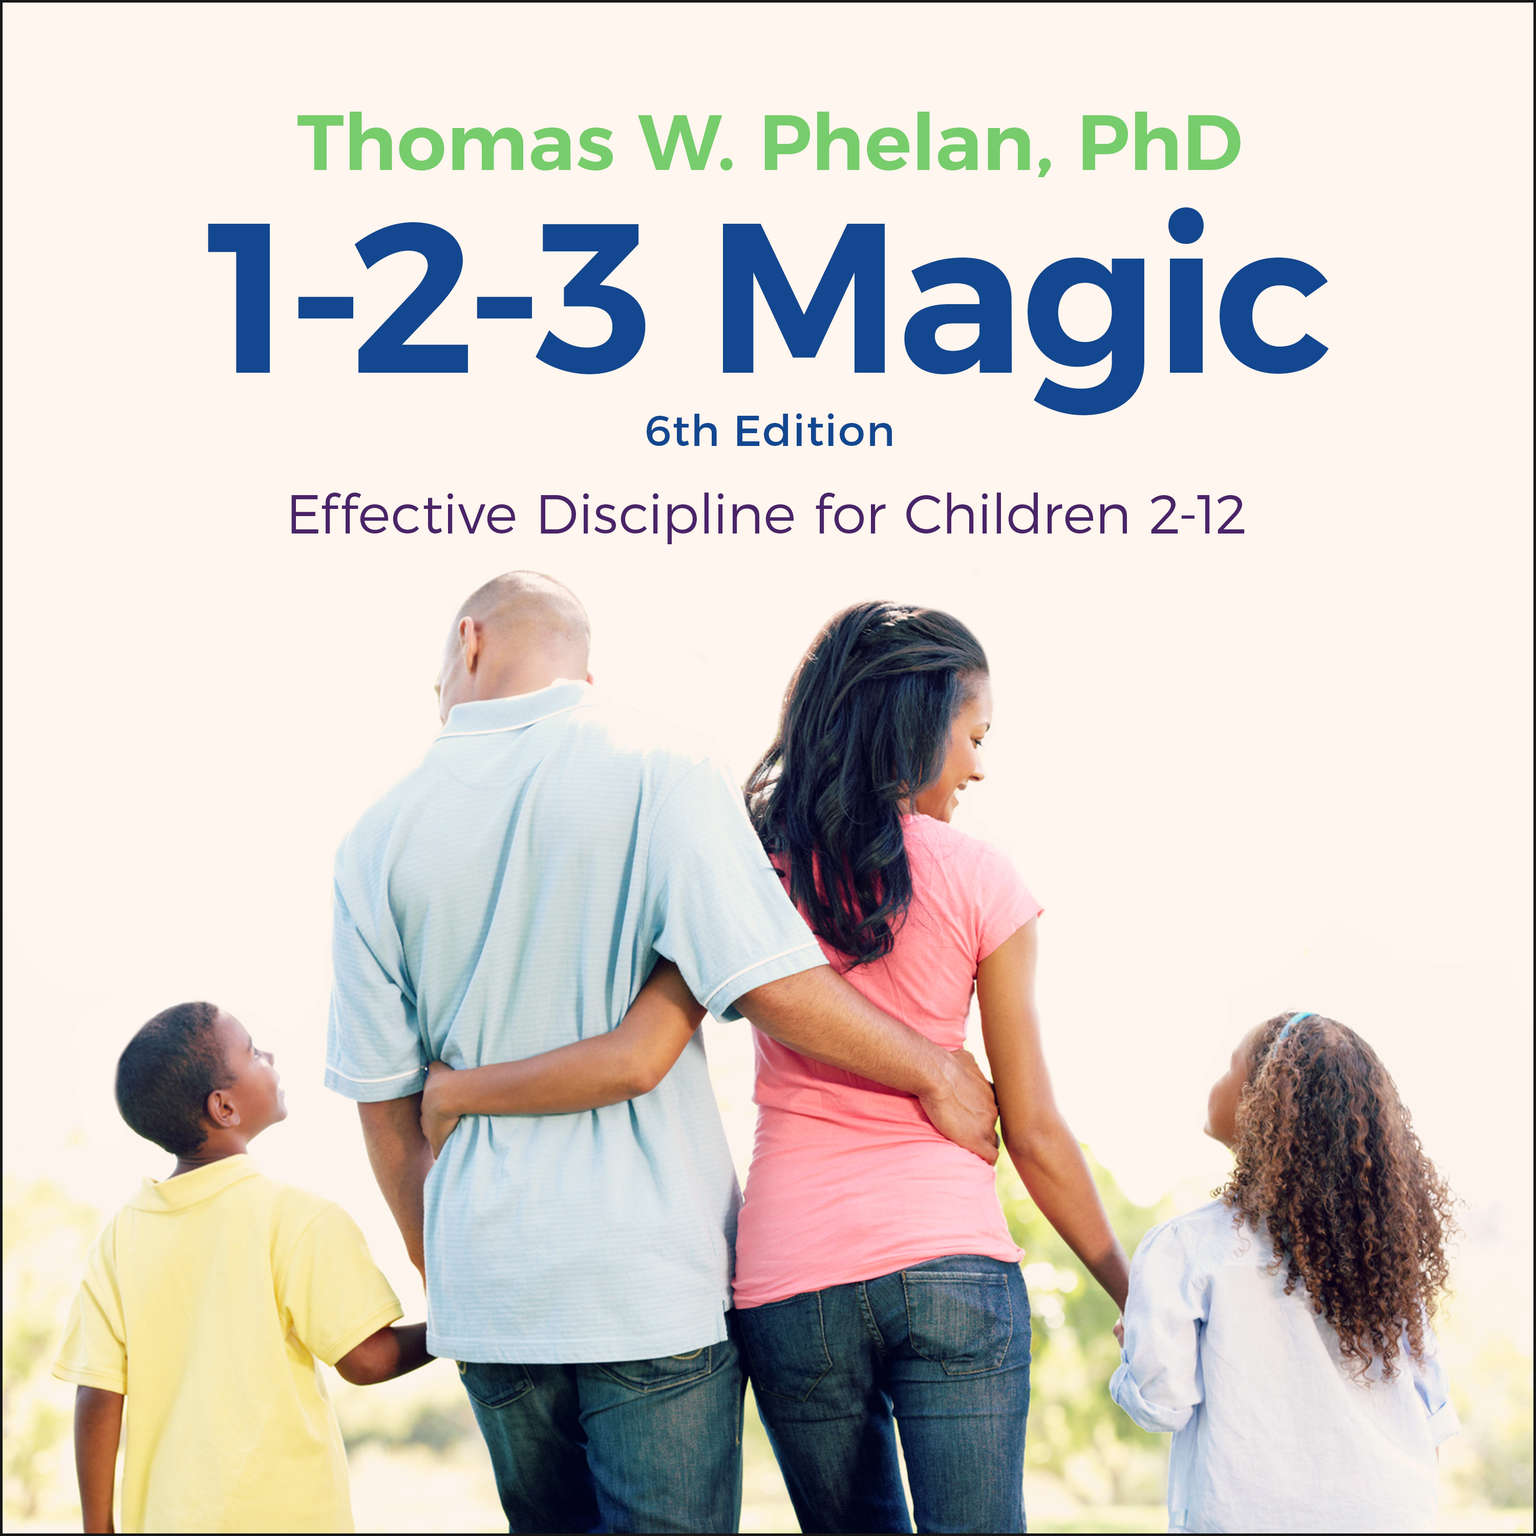 1-2-3 Magic: Effective Discipline for Children 2-12 (6th edition) Audiobook, by Thomas W. Phelan